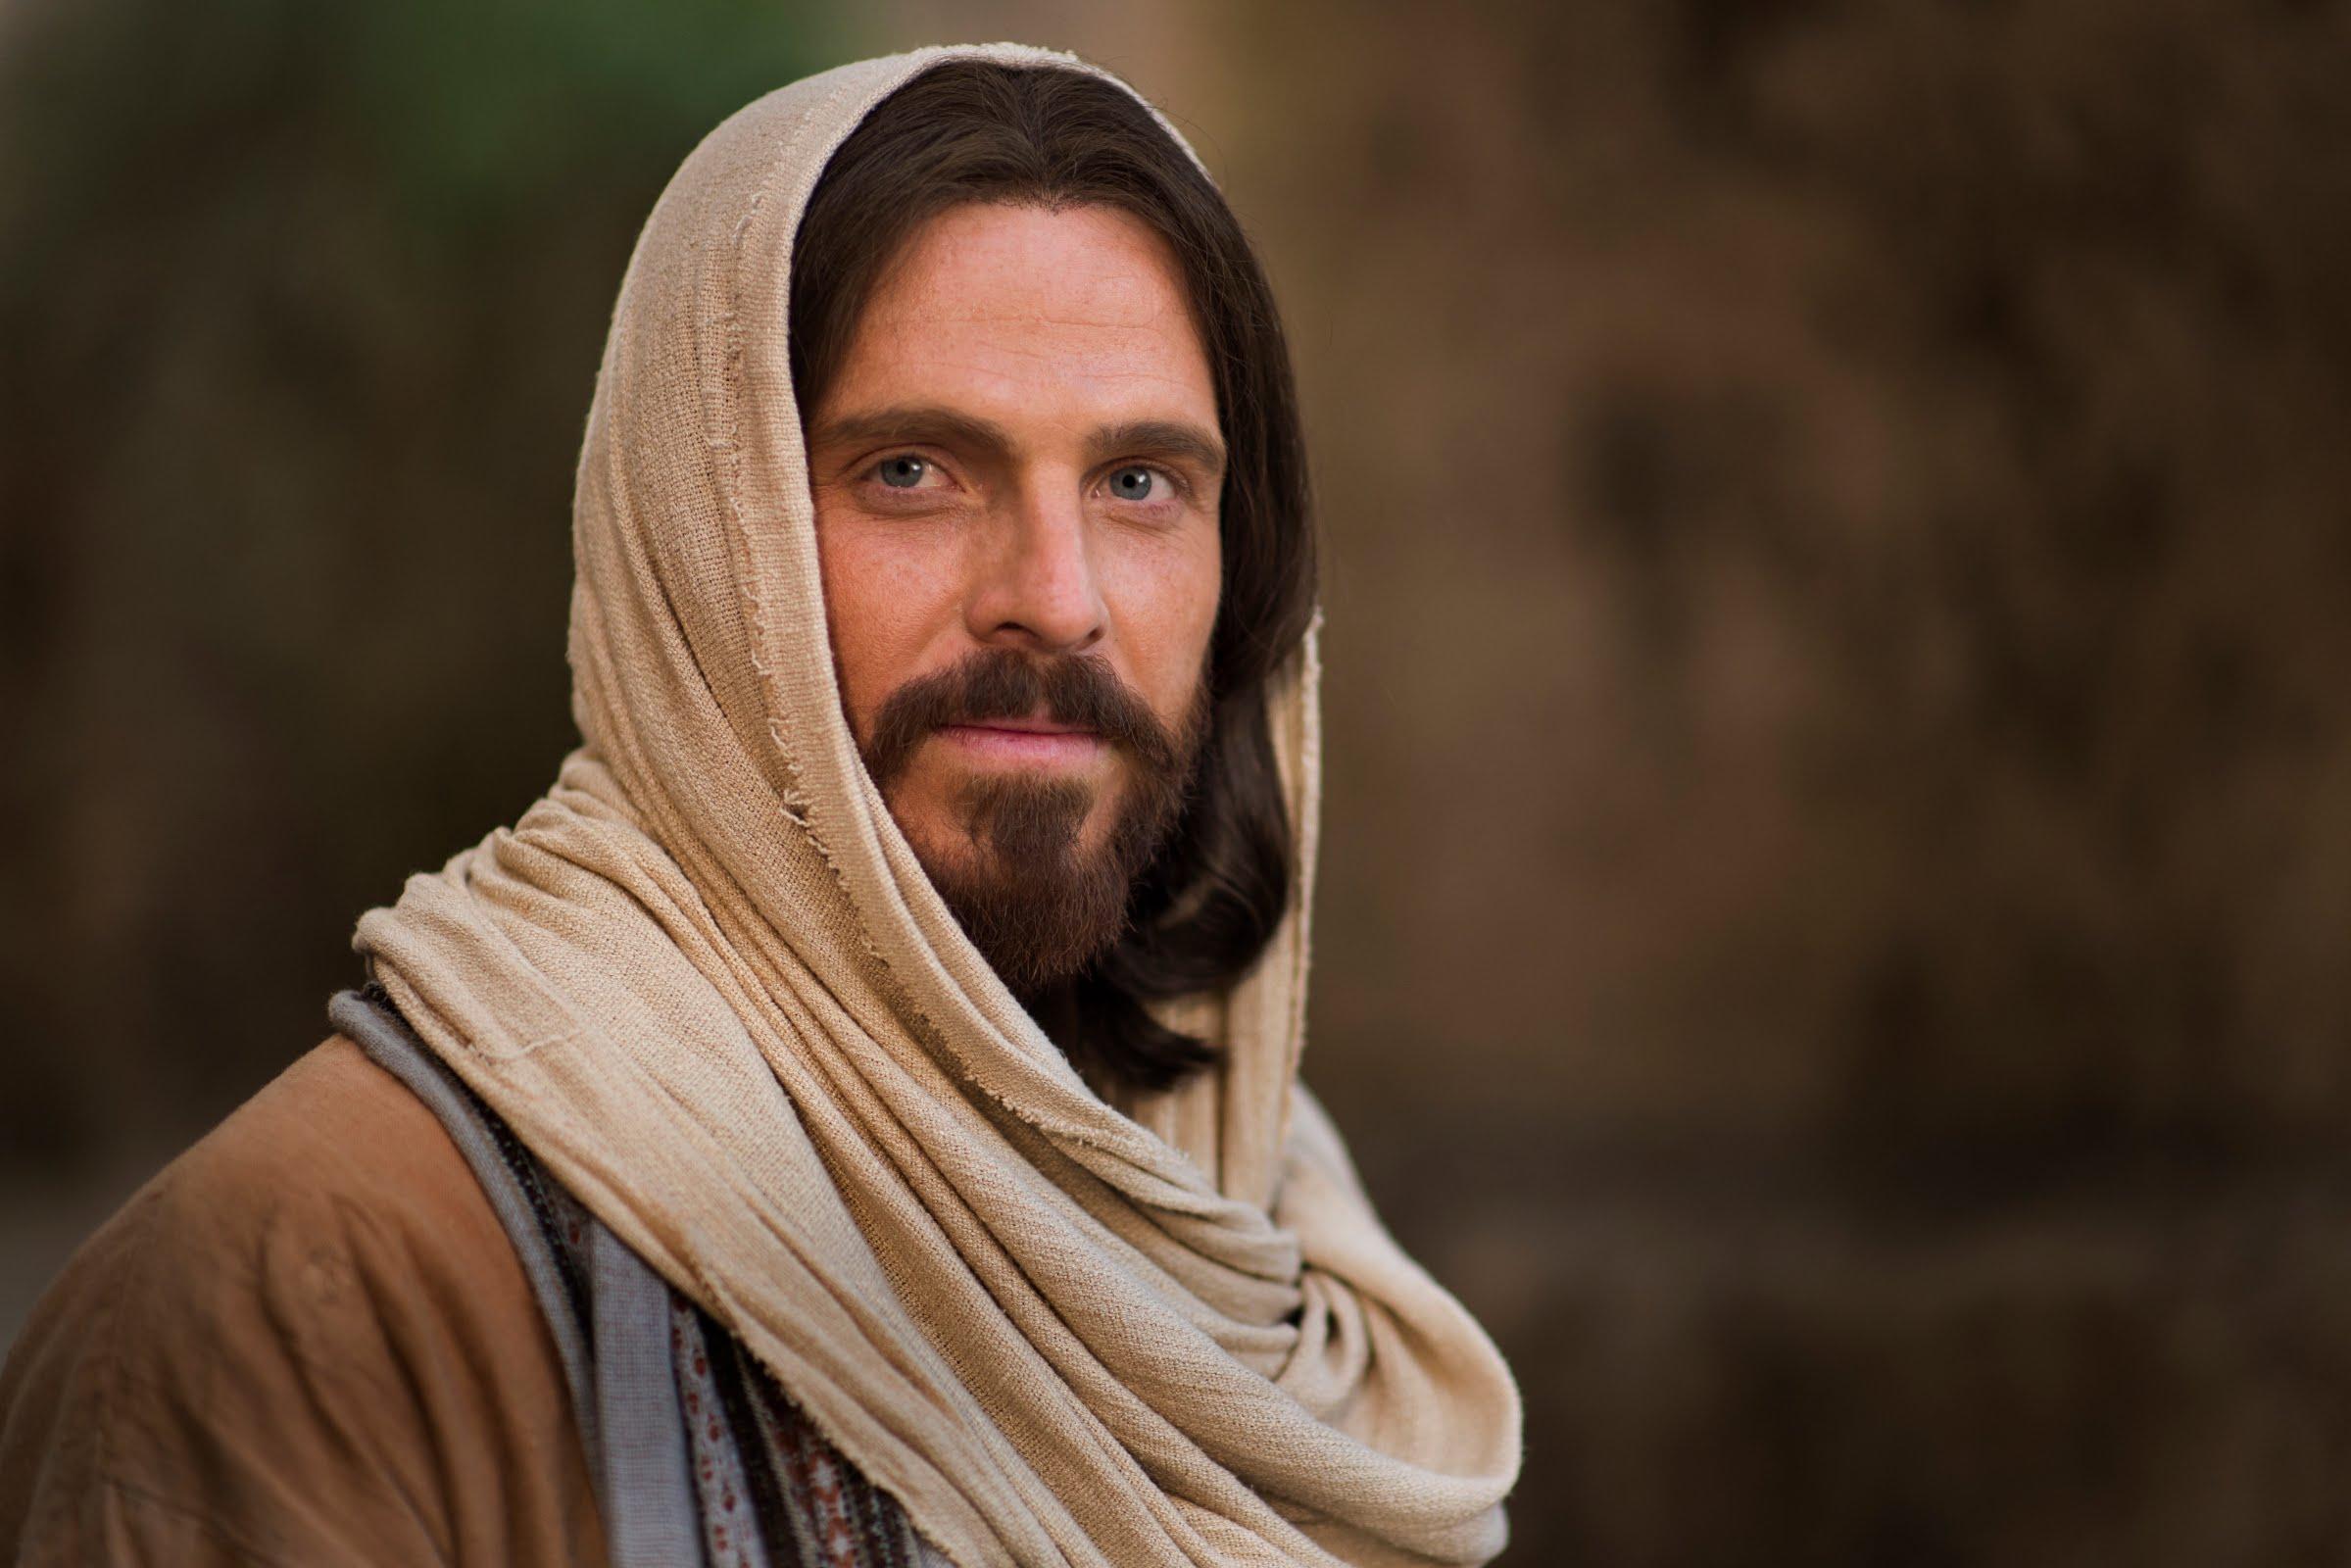 This Week in Mormons Christ